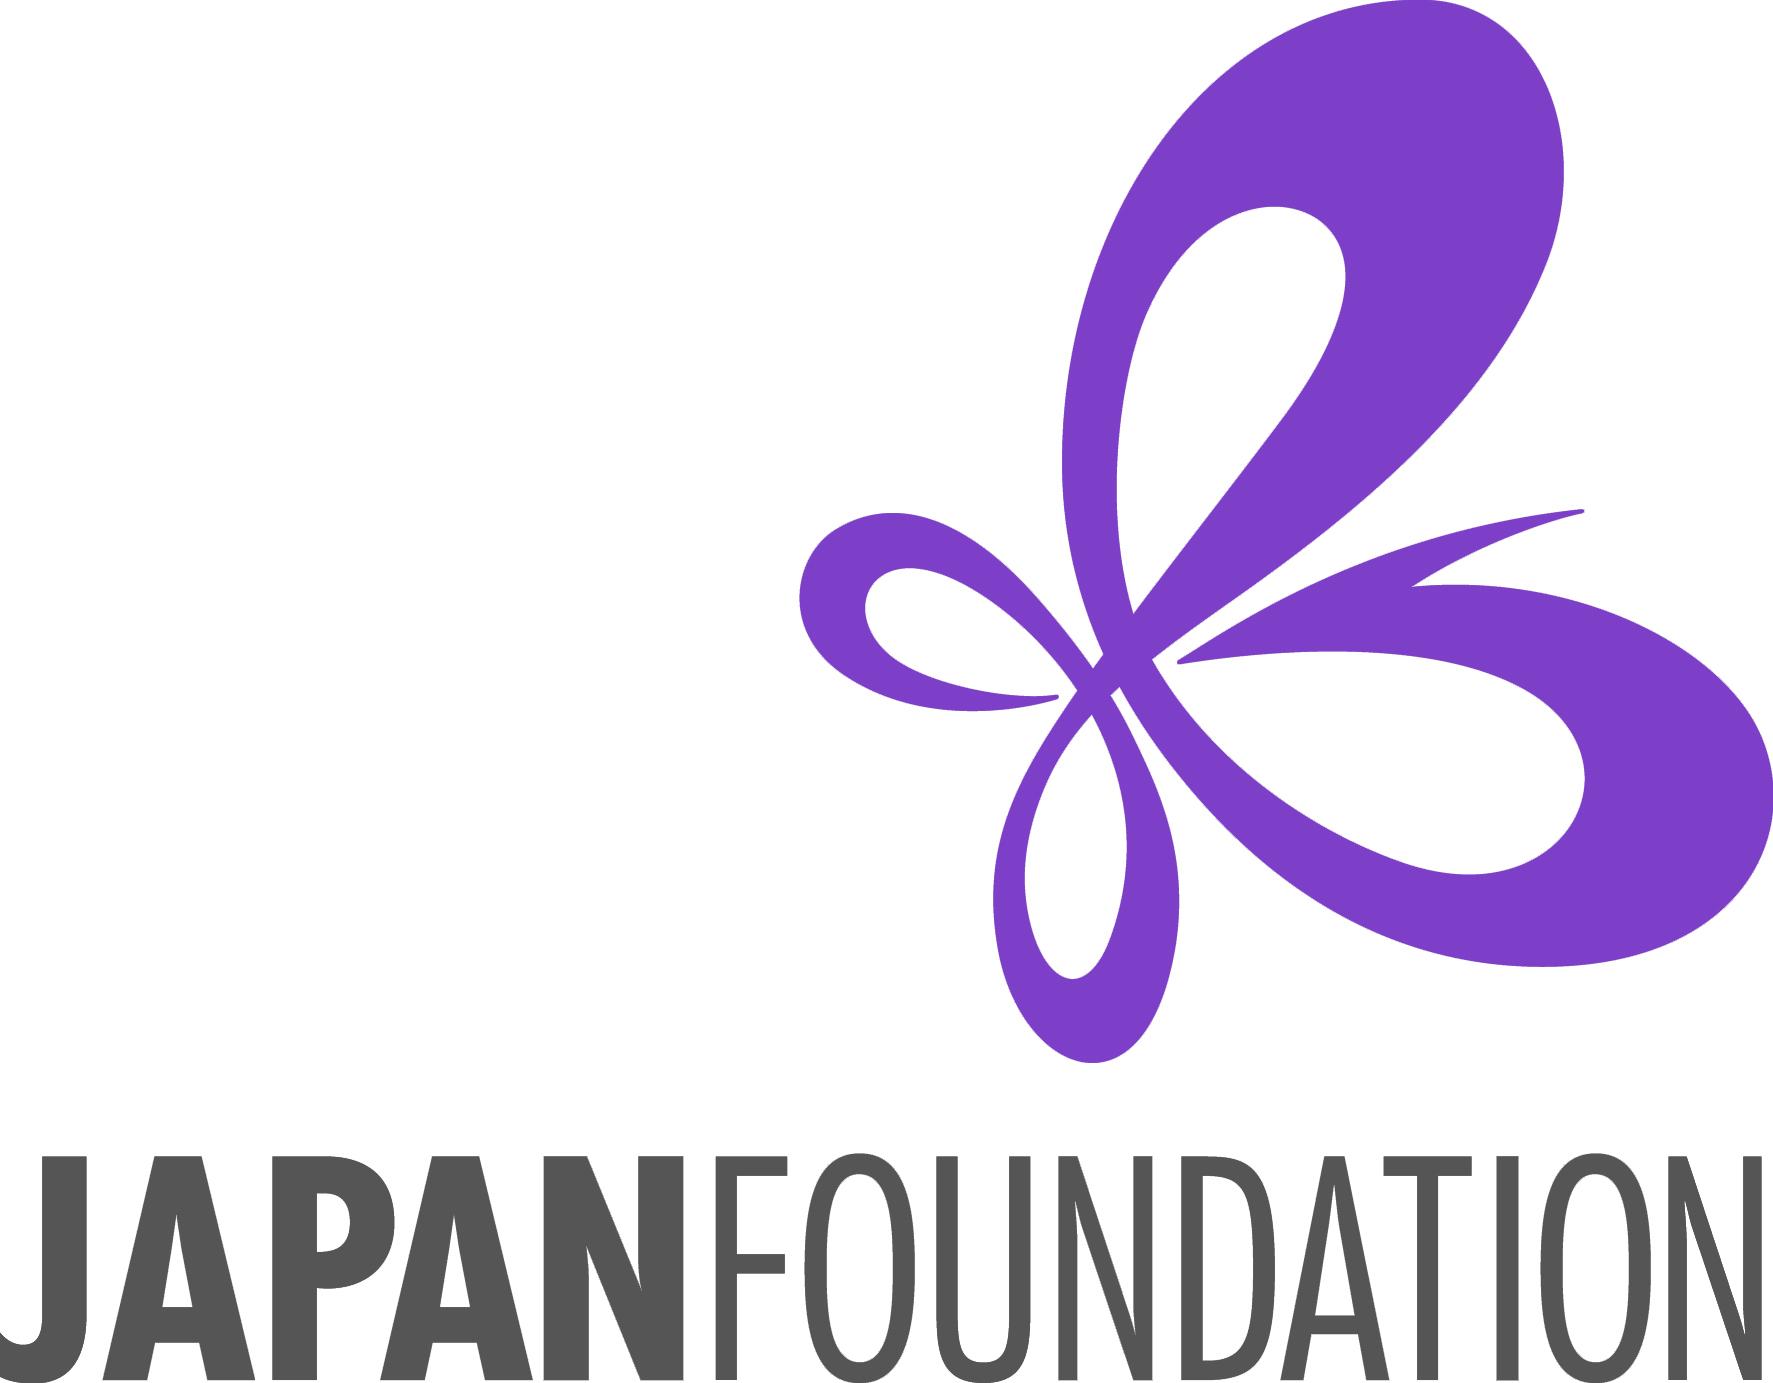 Logomark_A.JPG